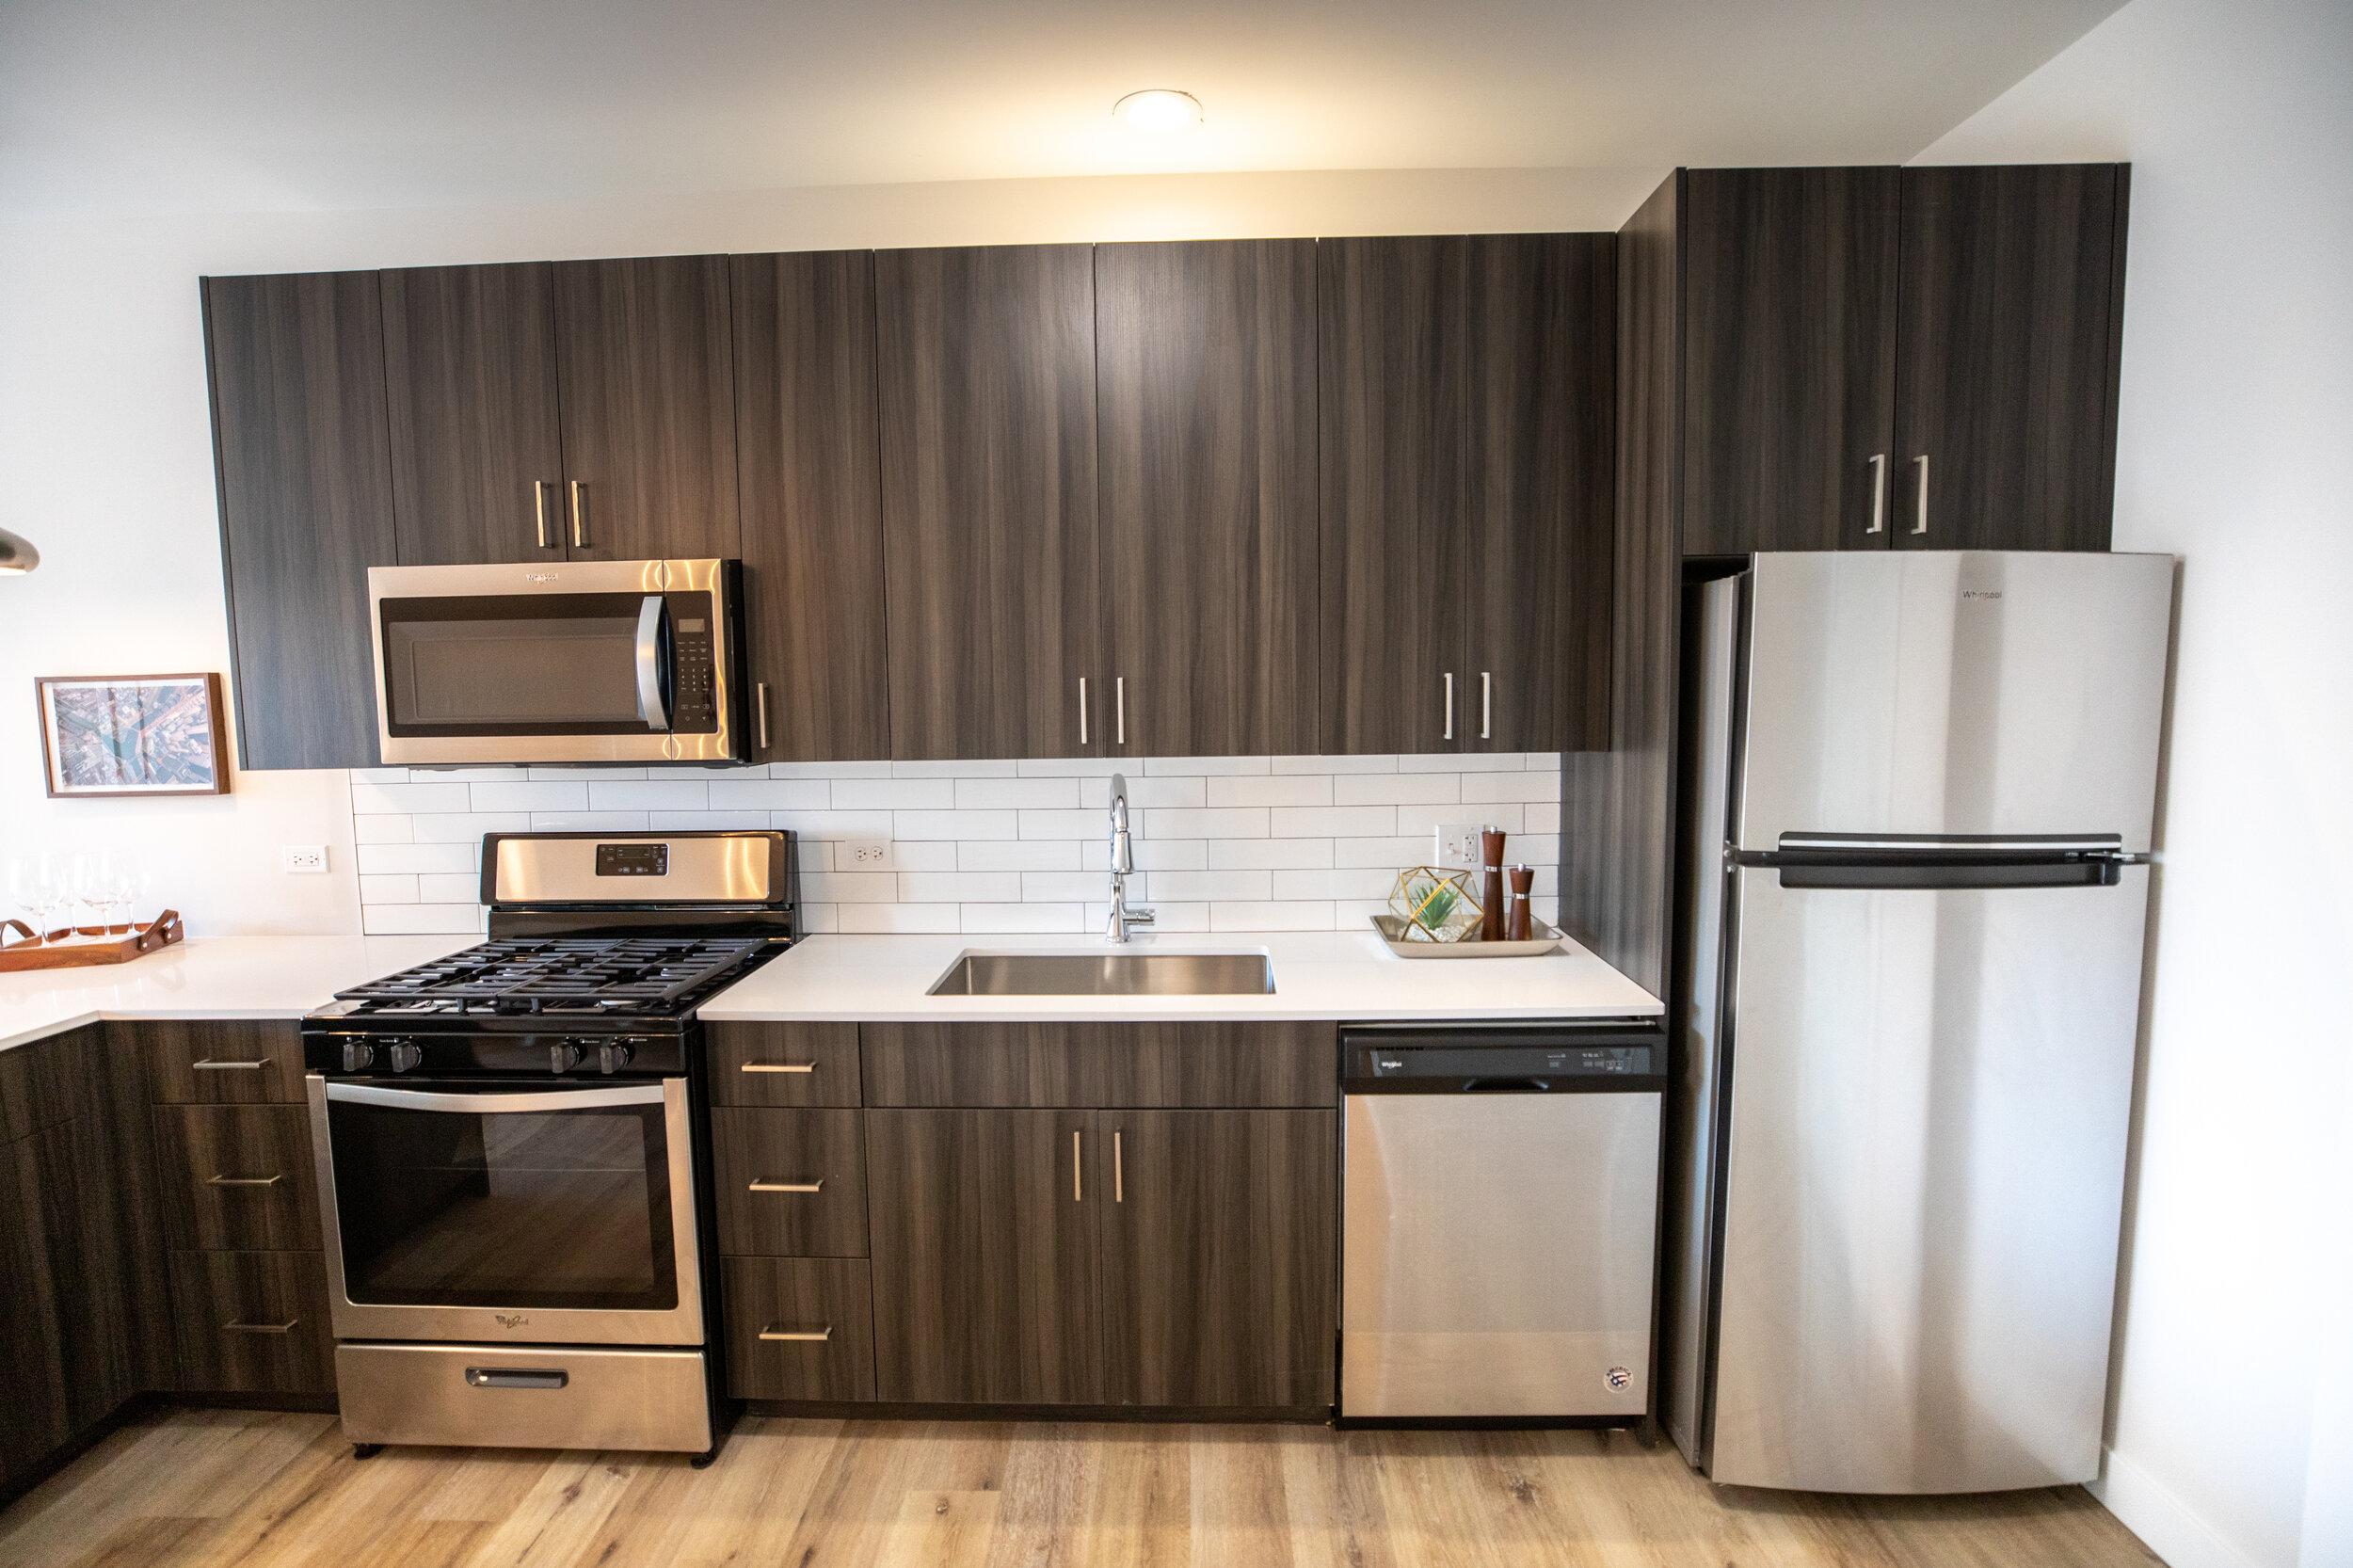 Unit Kitchen 2.jpg